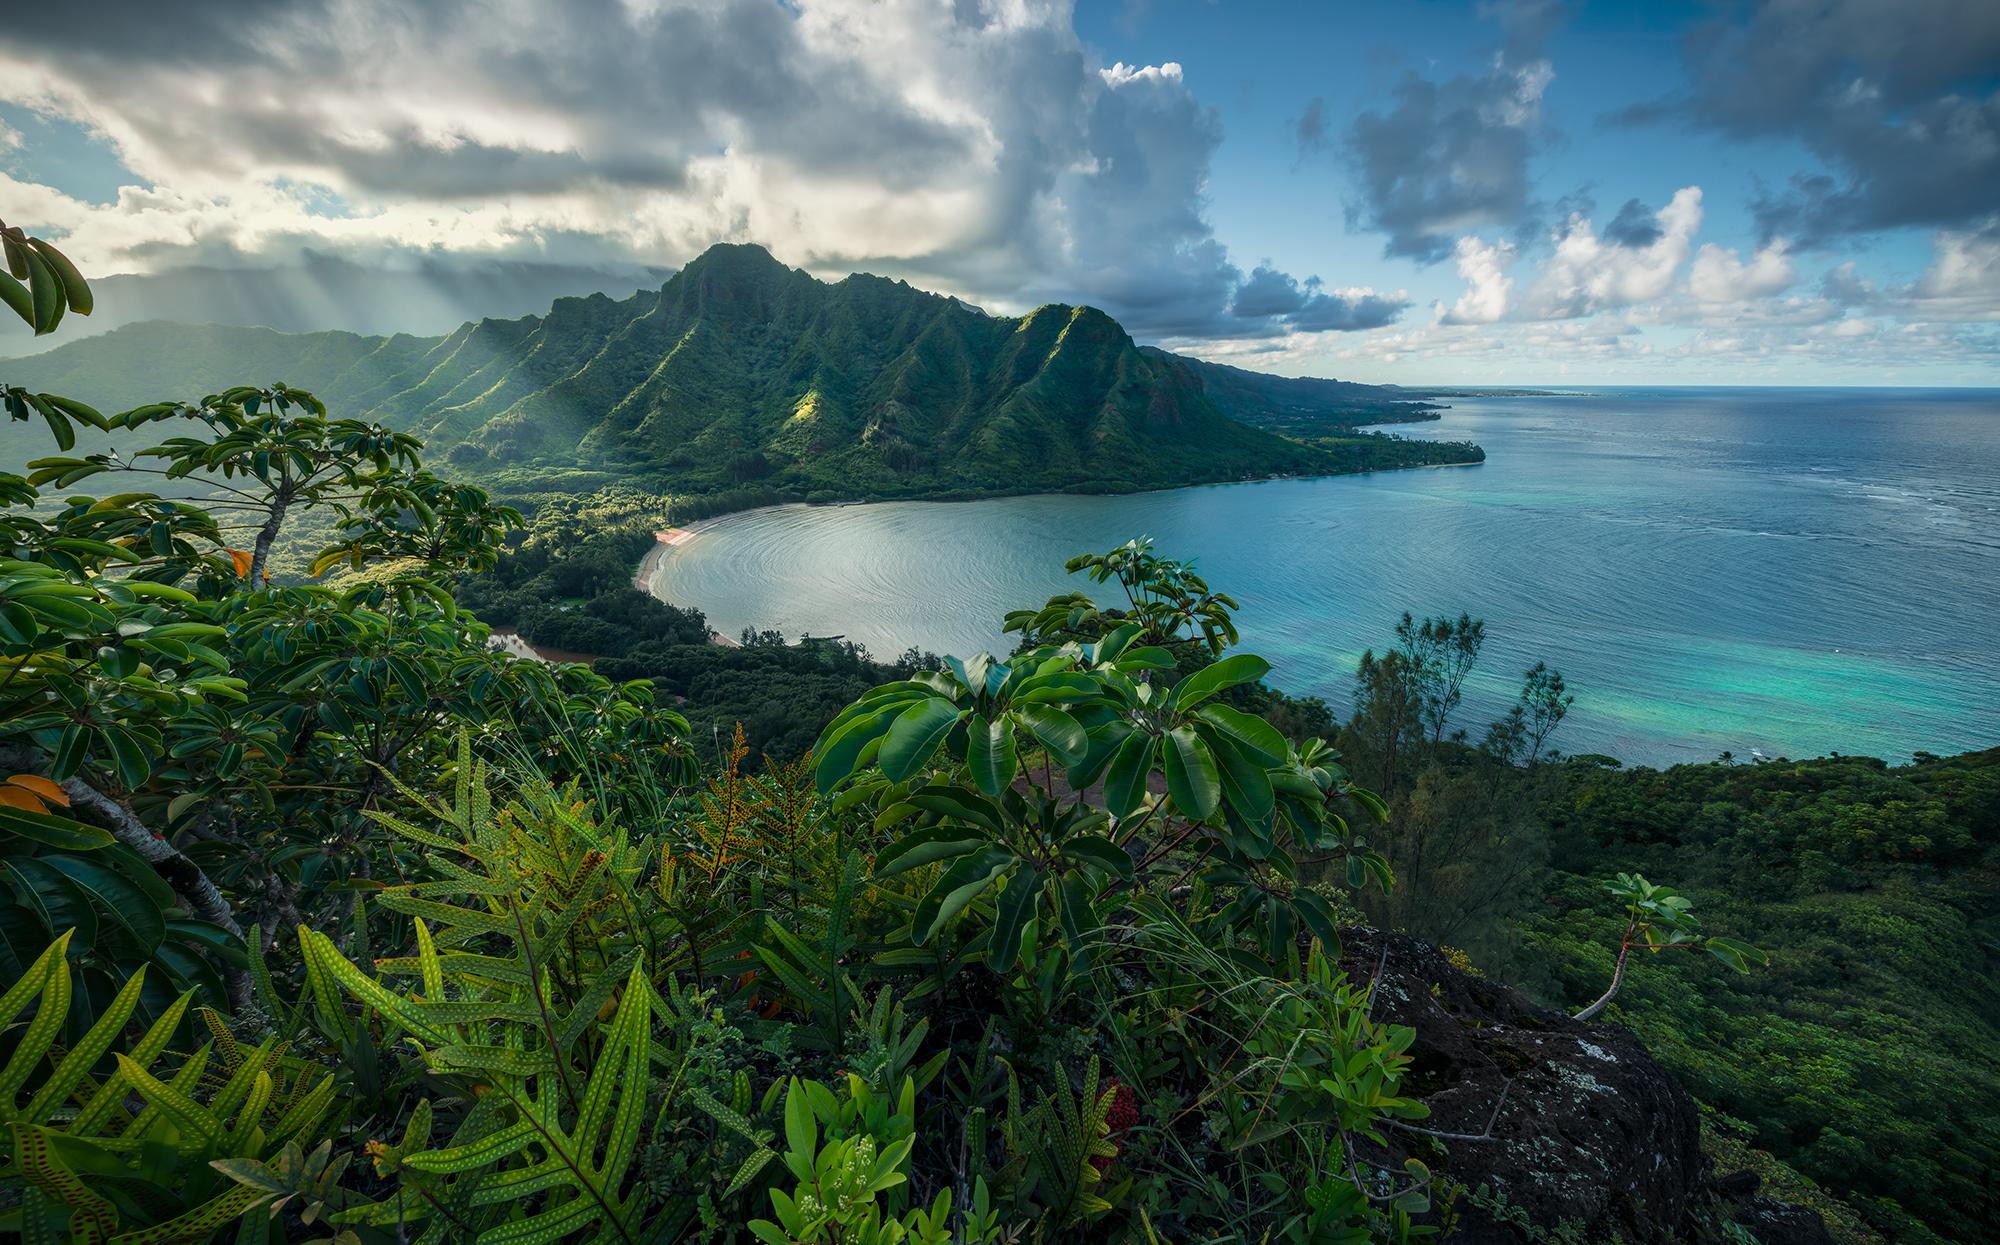 Stefan Hefele Edition 2 Fotobehang Komar - Natuur behang JURASSIC ISLAND